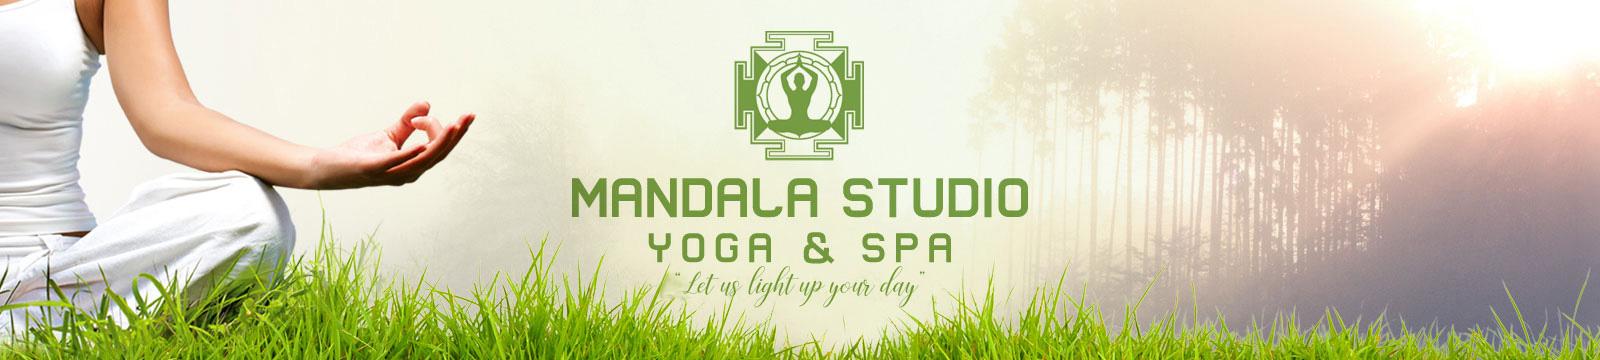 Mandala Yoga Studio logo